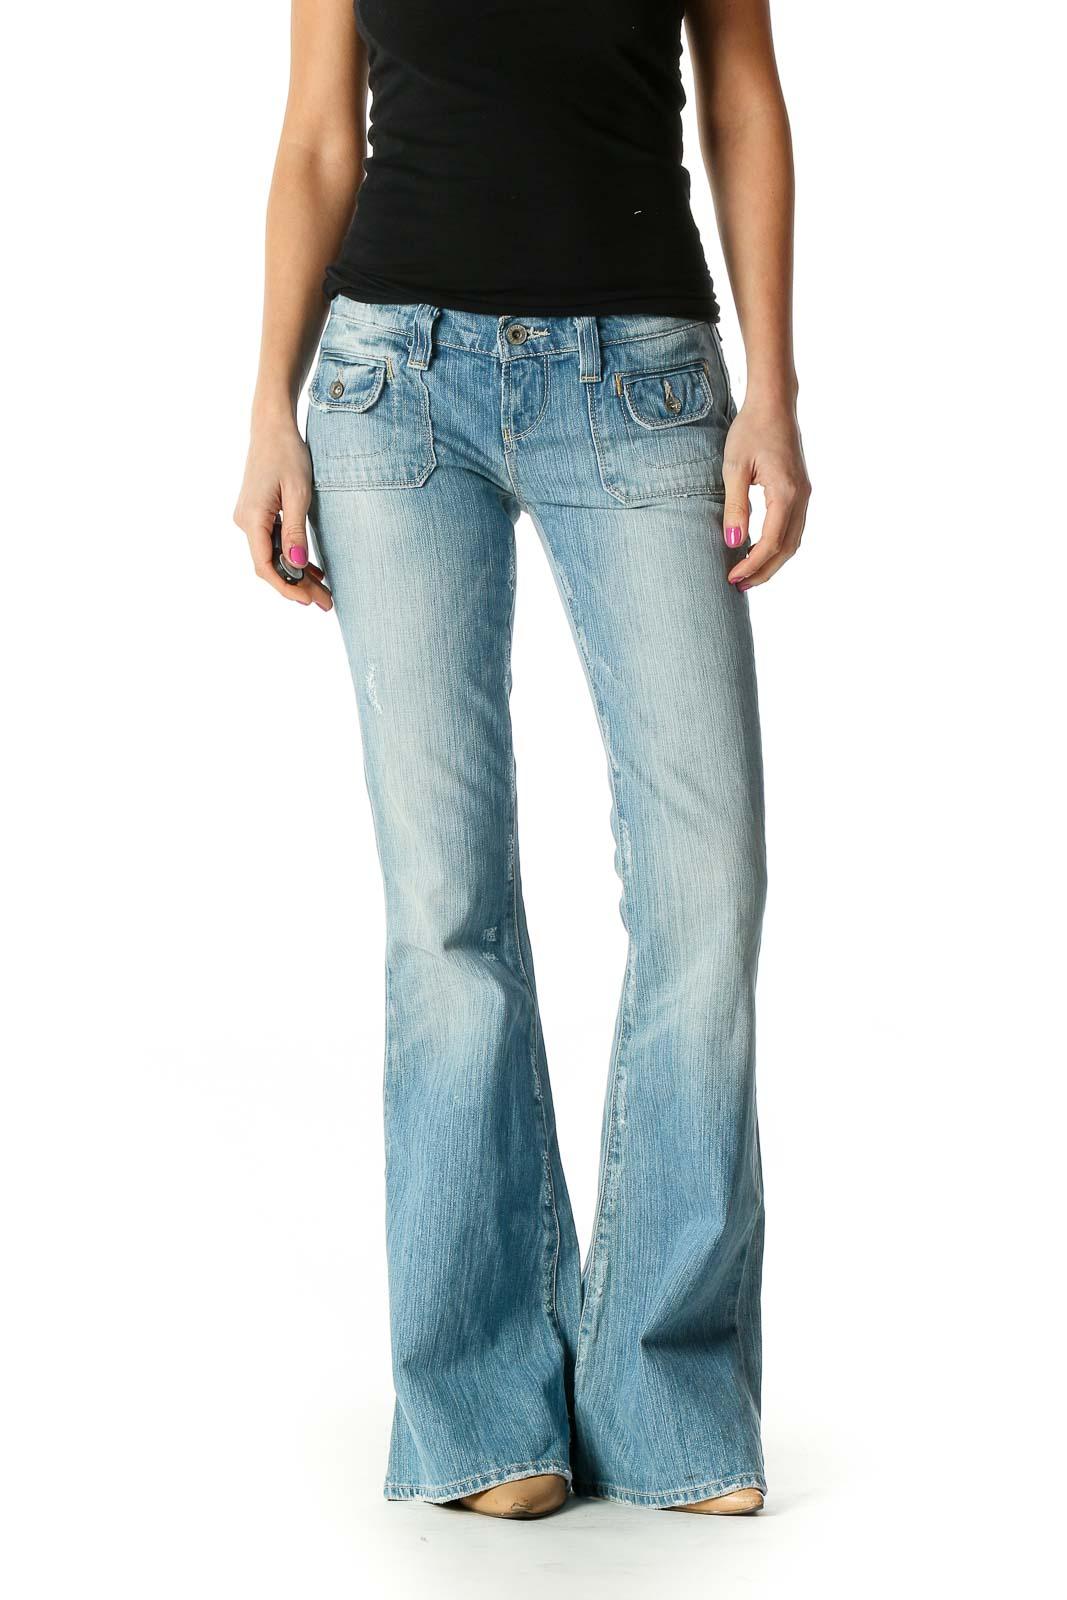 Blue Retro Bootcut Jeans Front